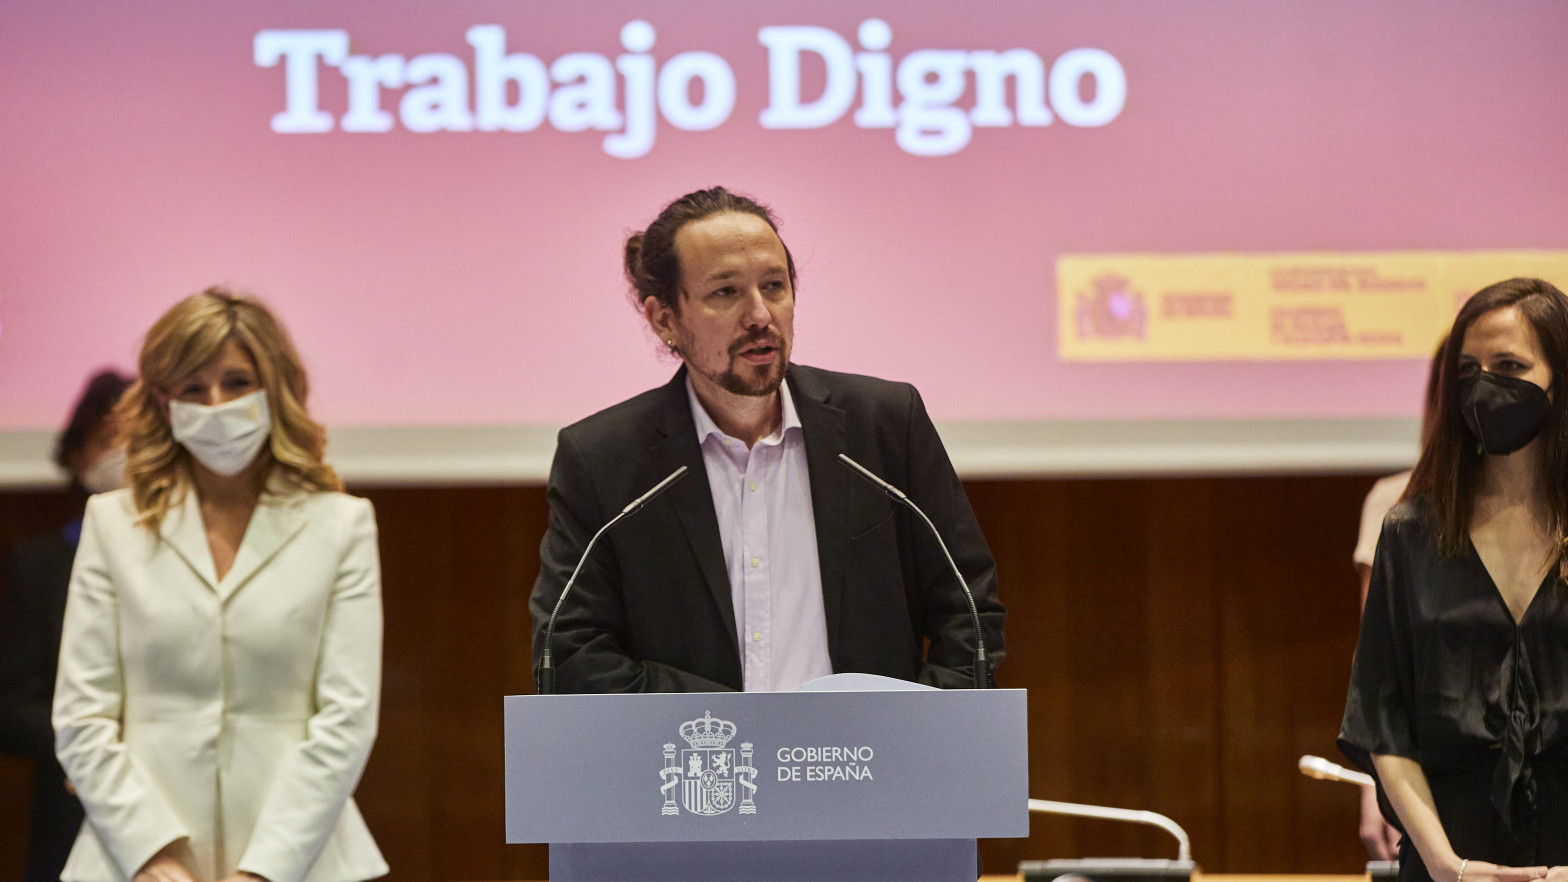 Pablo Iglesias propone retirar todas las ayudas a la tauromaquia